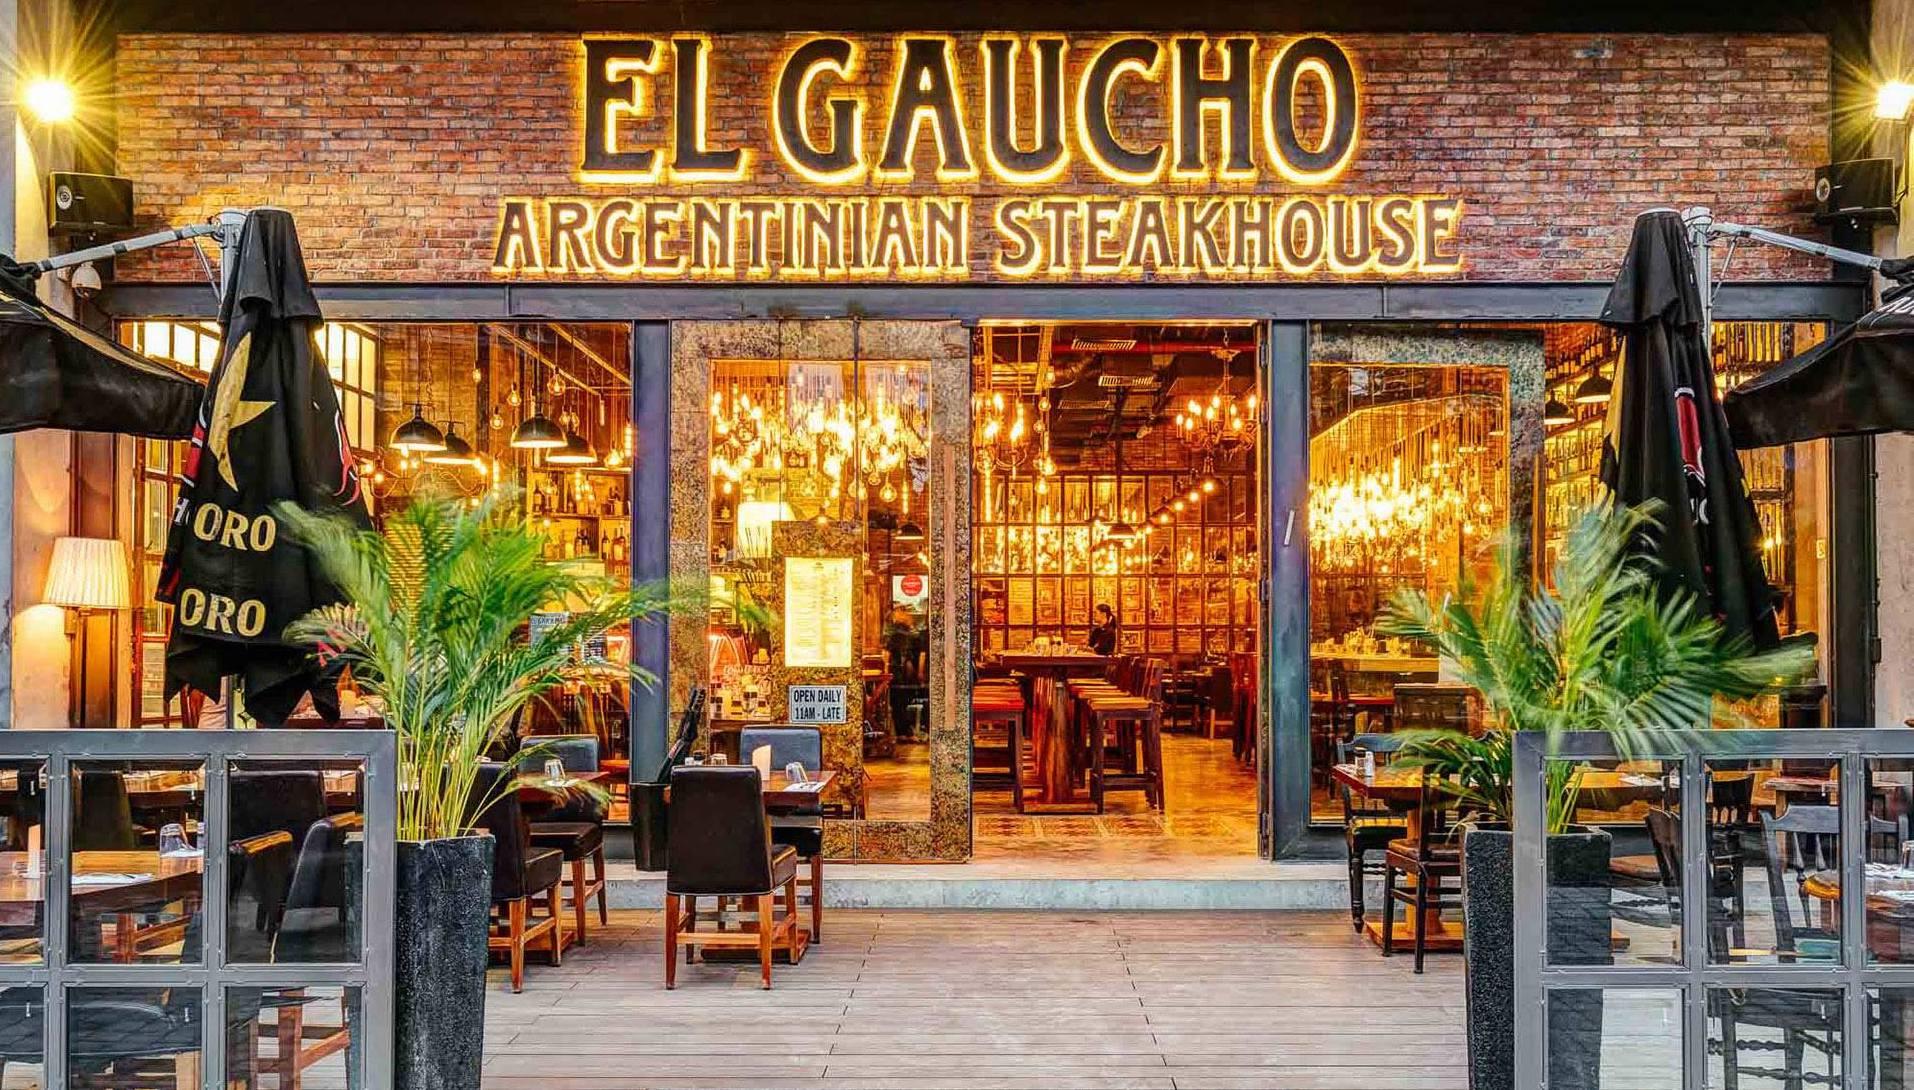 El Gaucho Steakhouse